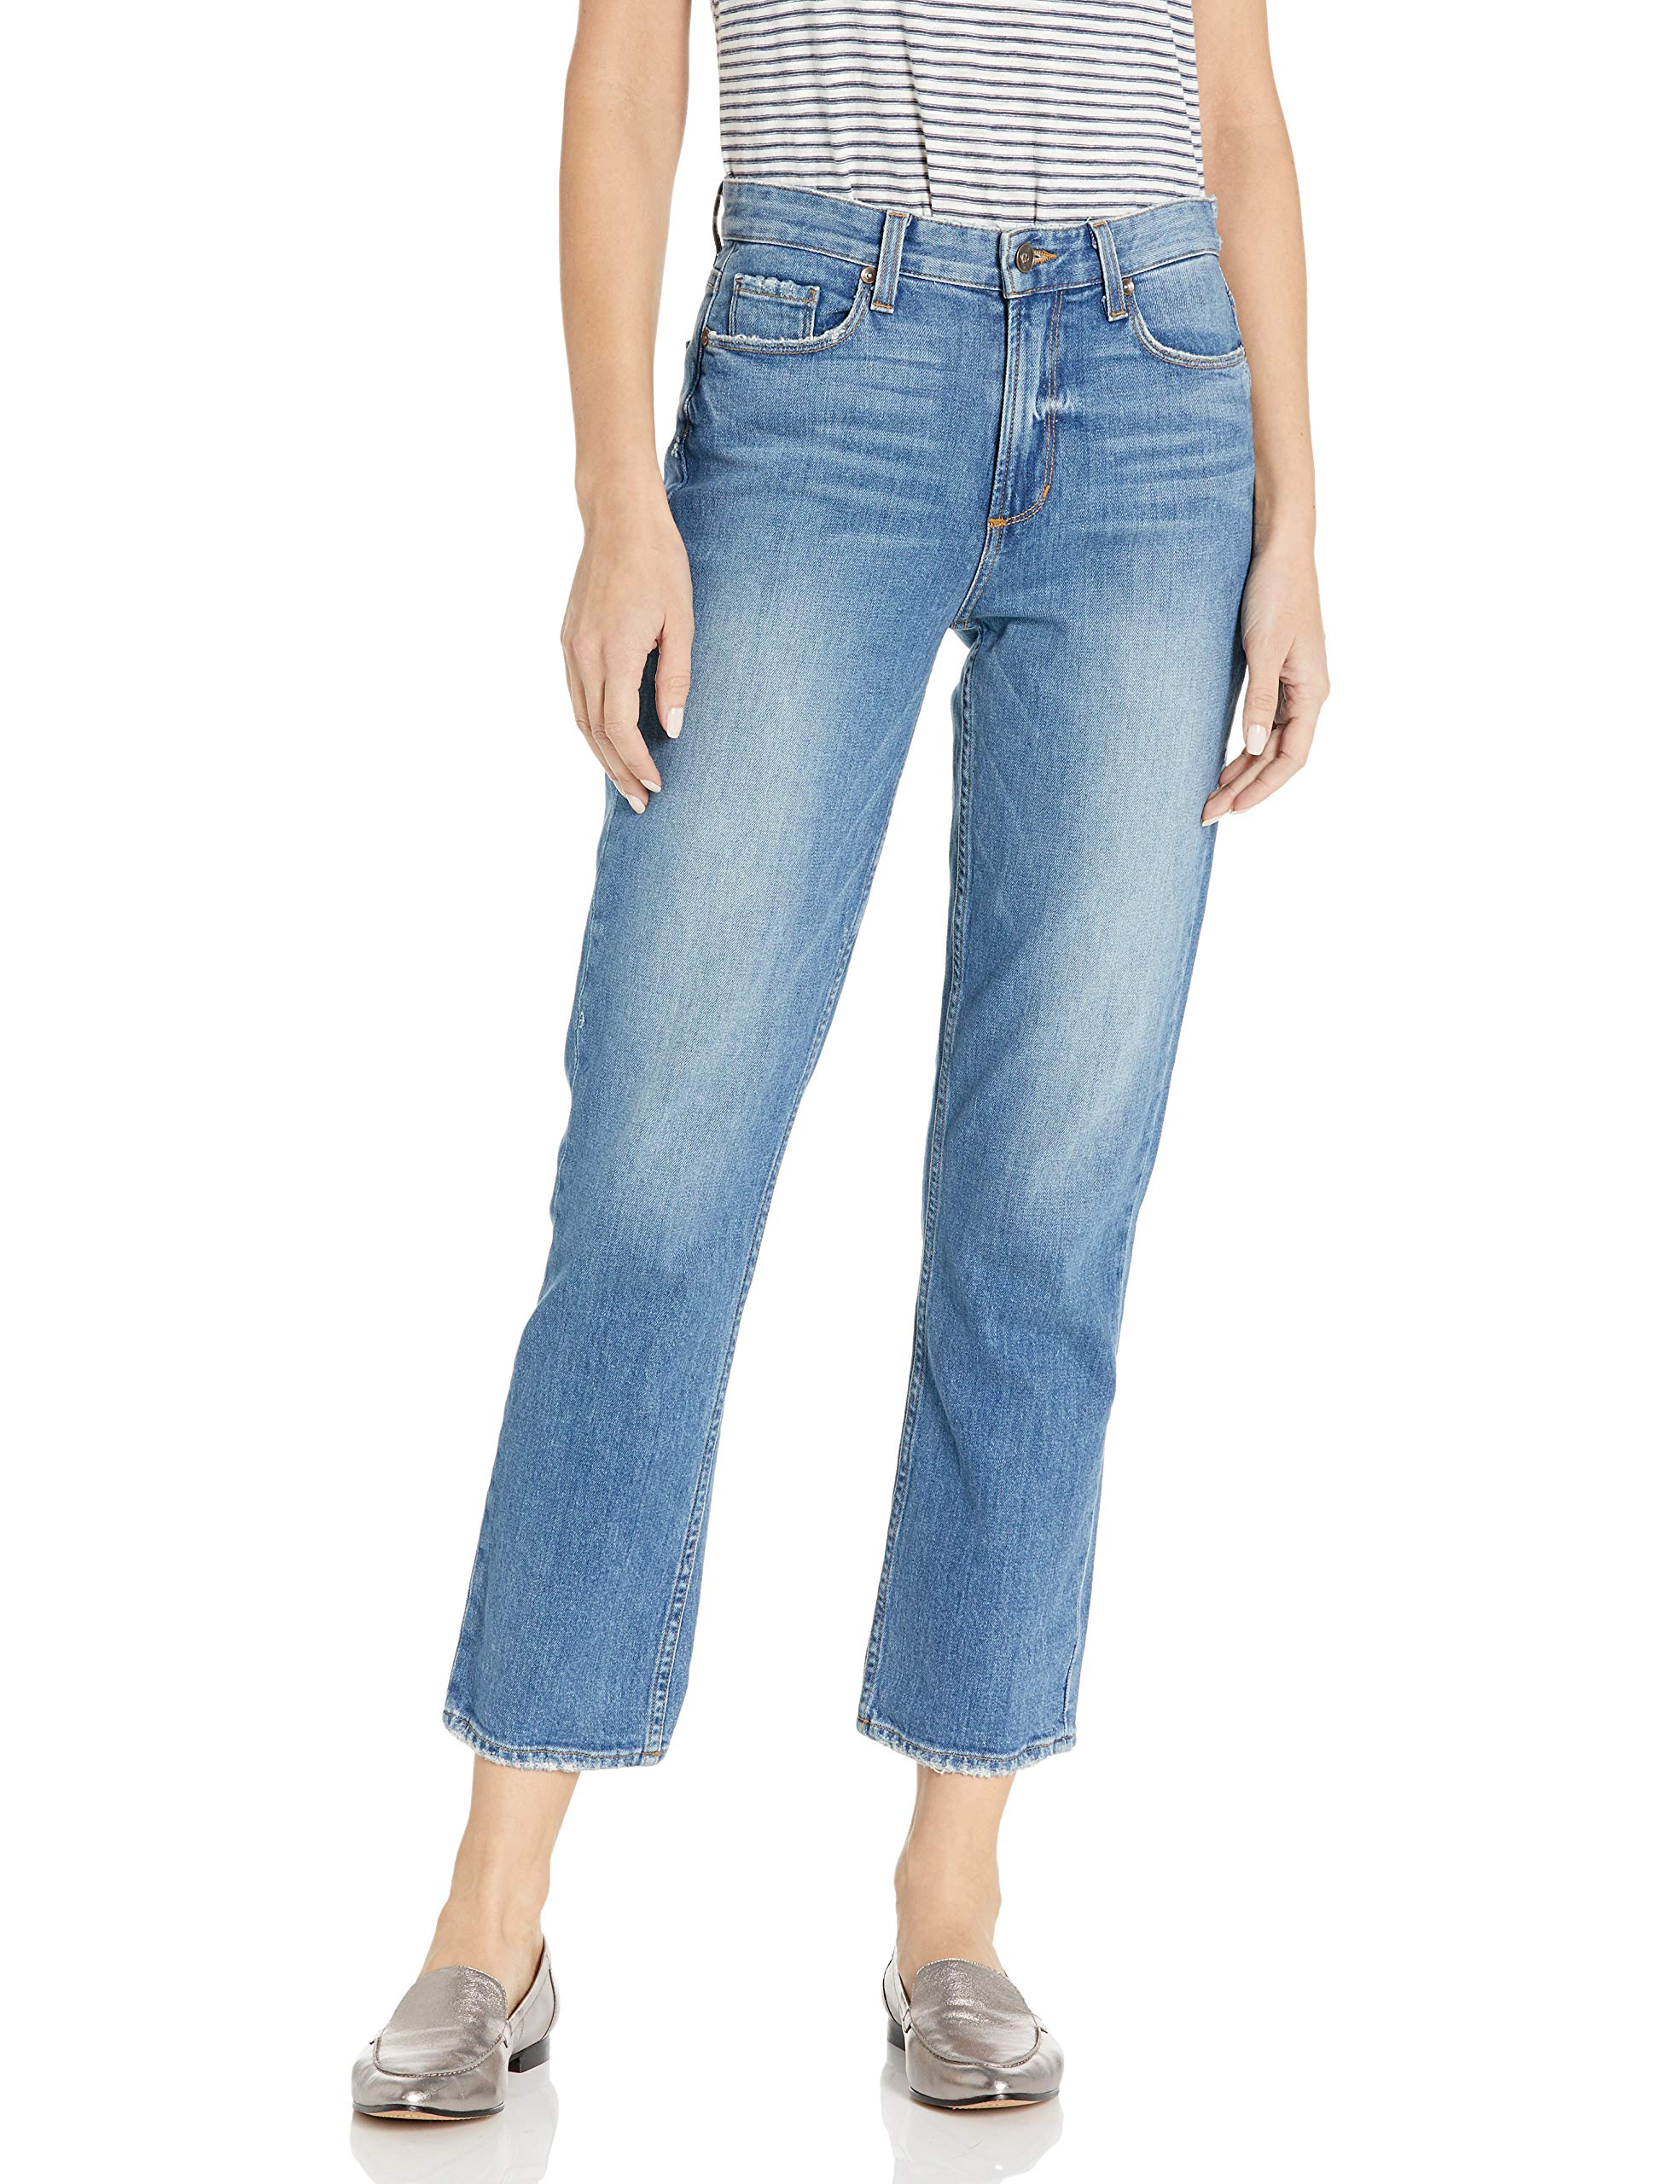 PAIGE Women's High Rise Sarah Slim Jeans